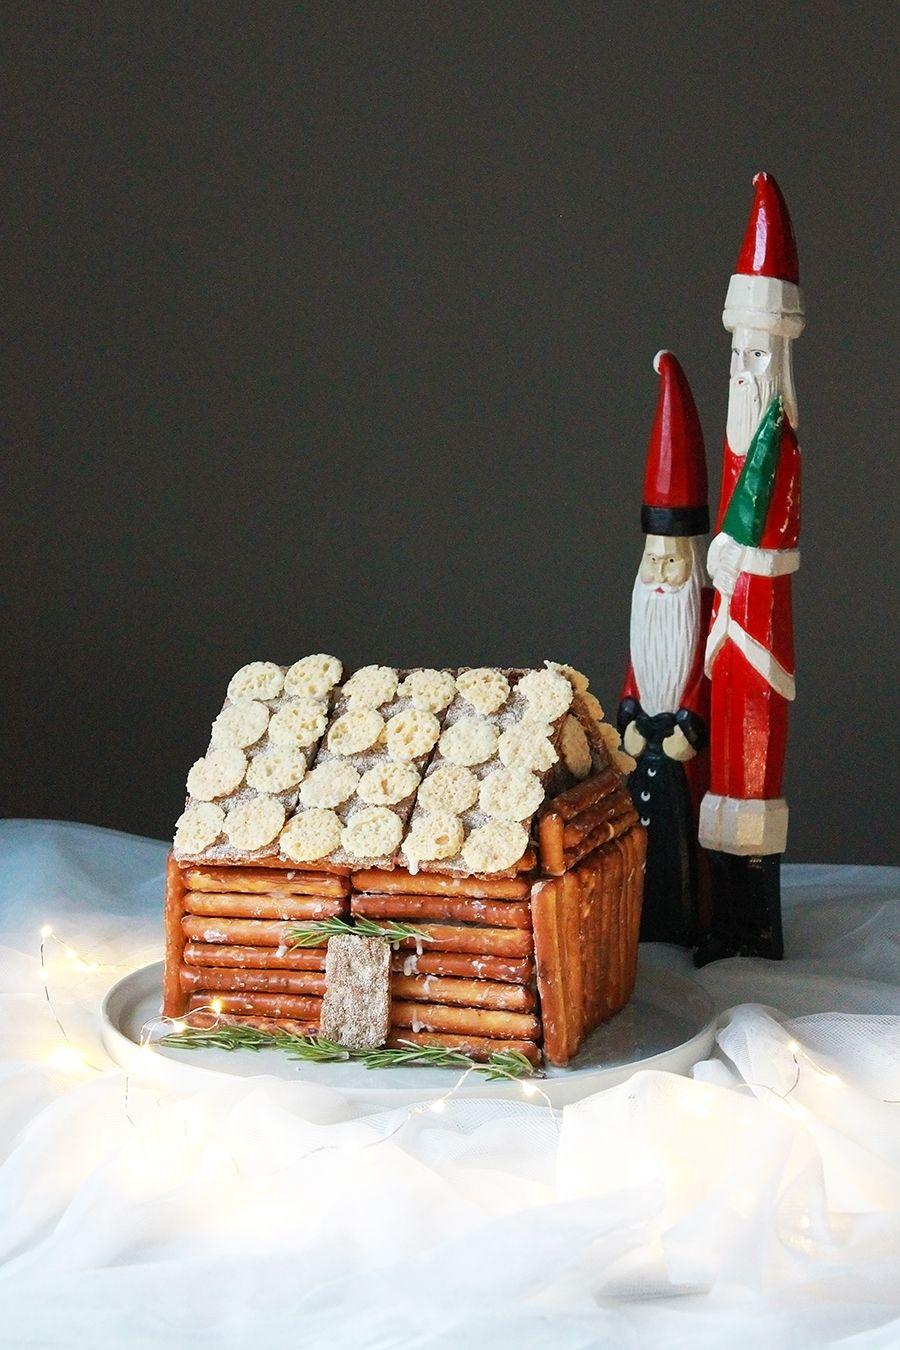 Savory holiday house with cellowhisps savorywhispshouse